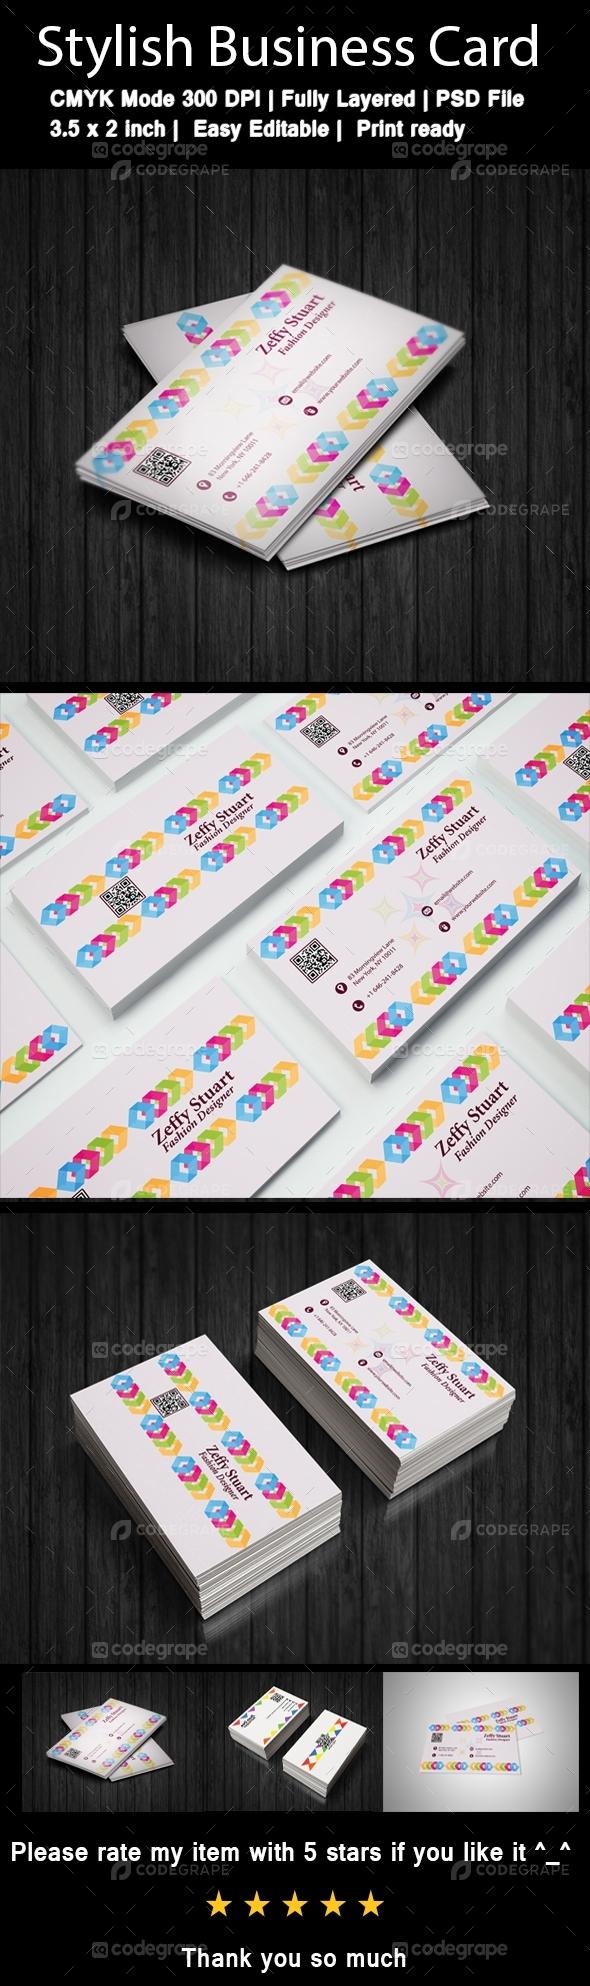 Modern Business Card For Fashion Designer